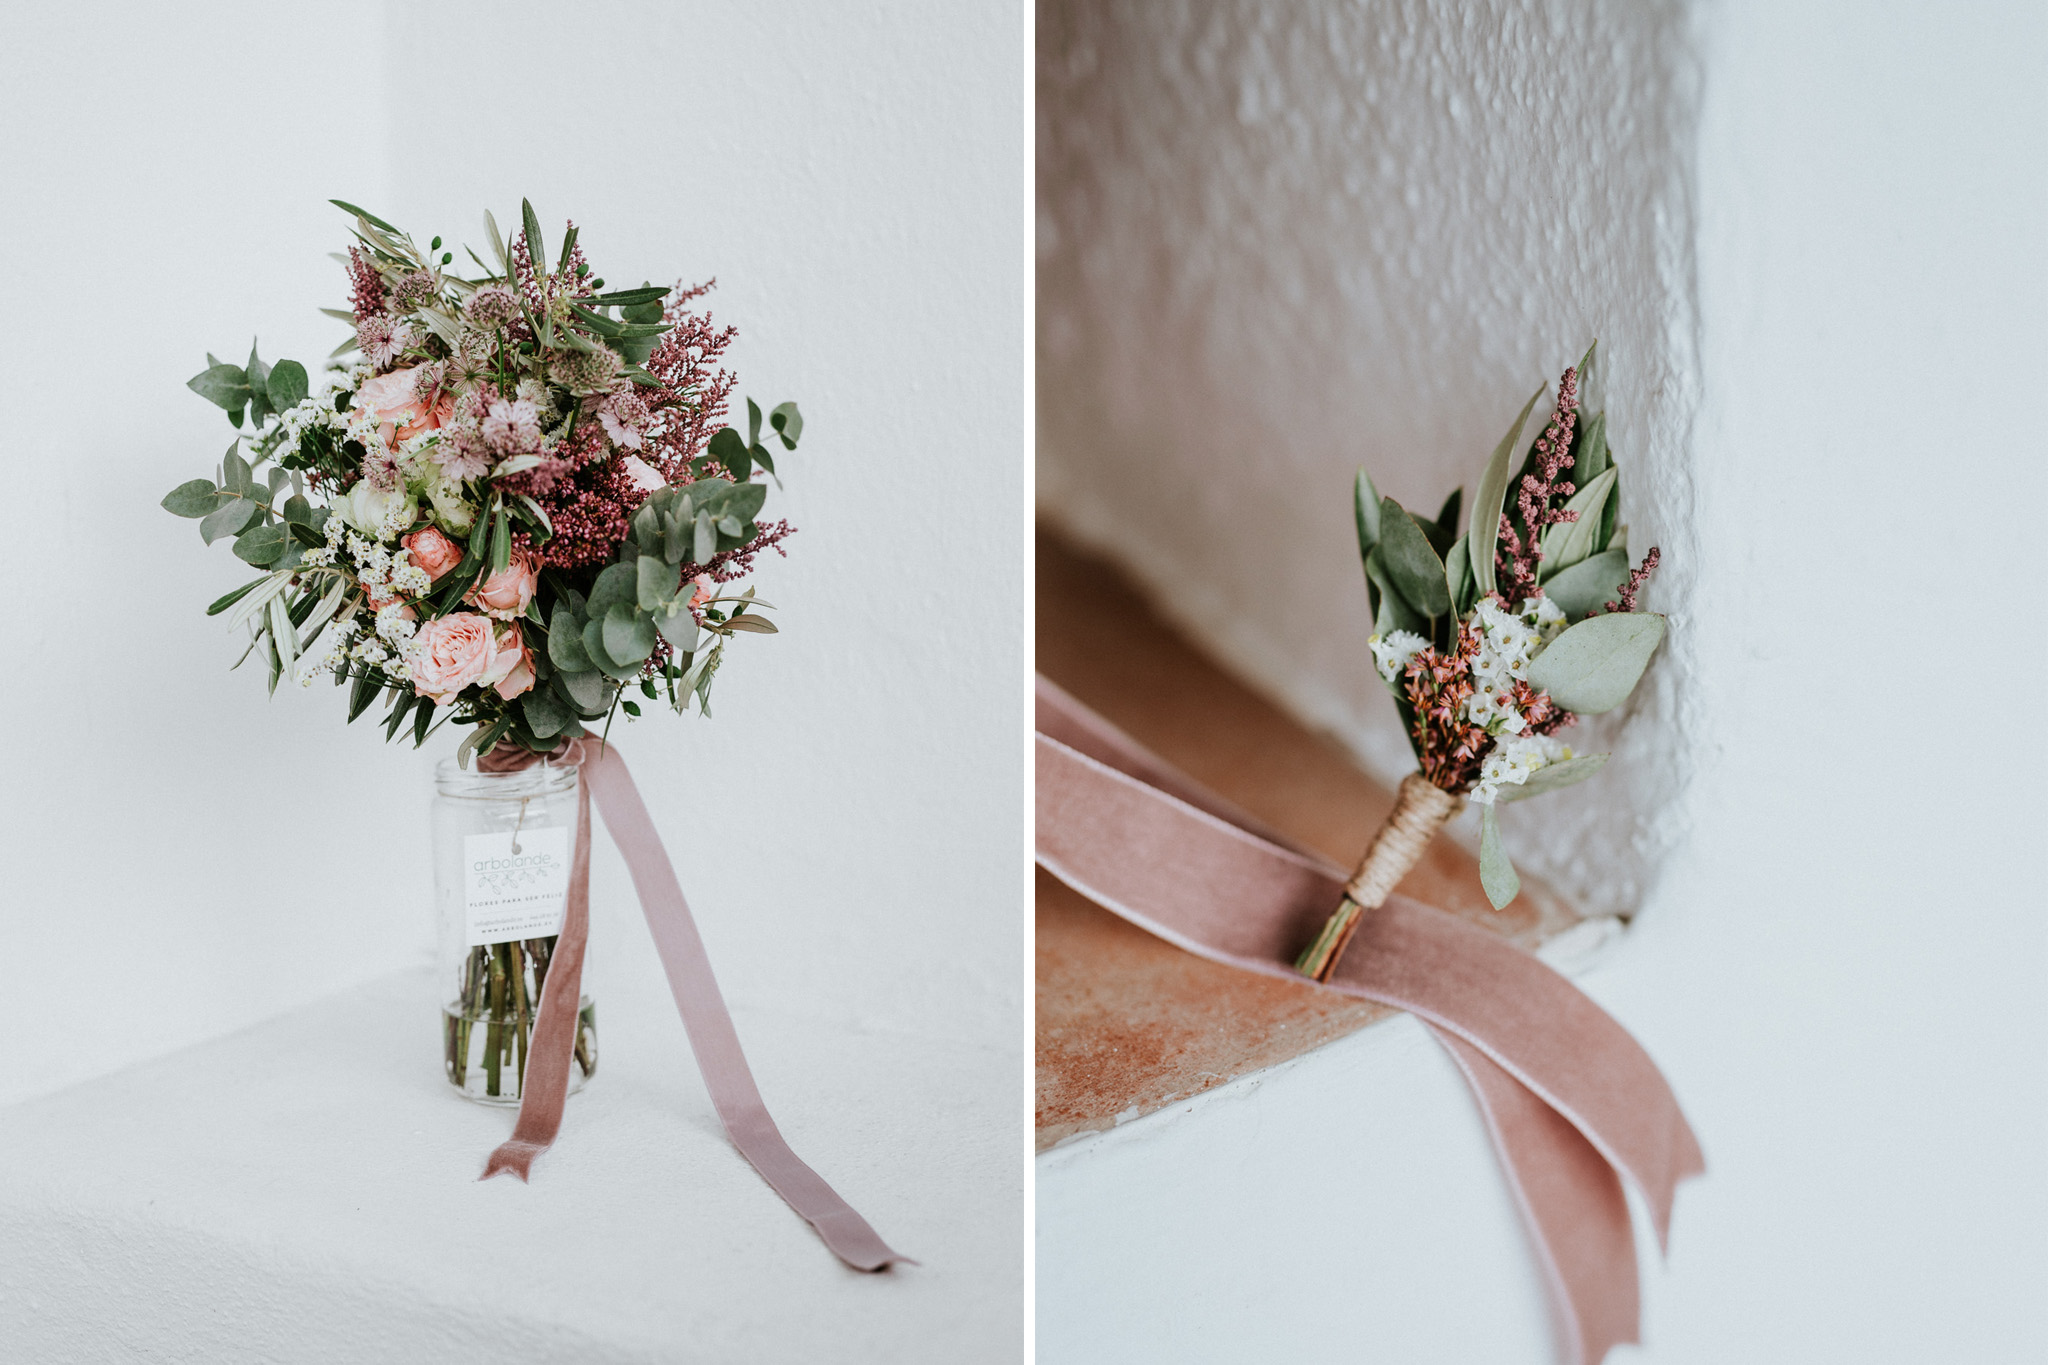 fotografia-boda-wedding-photographer-spain-concorazon-12